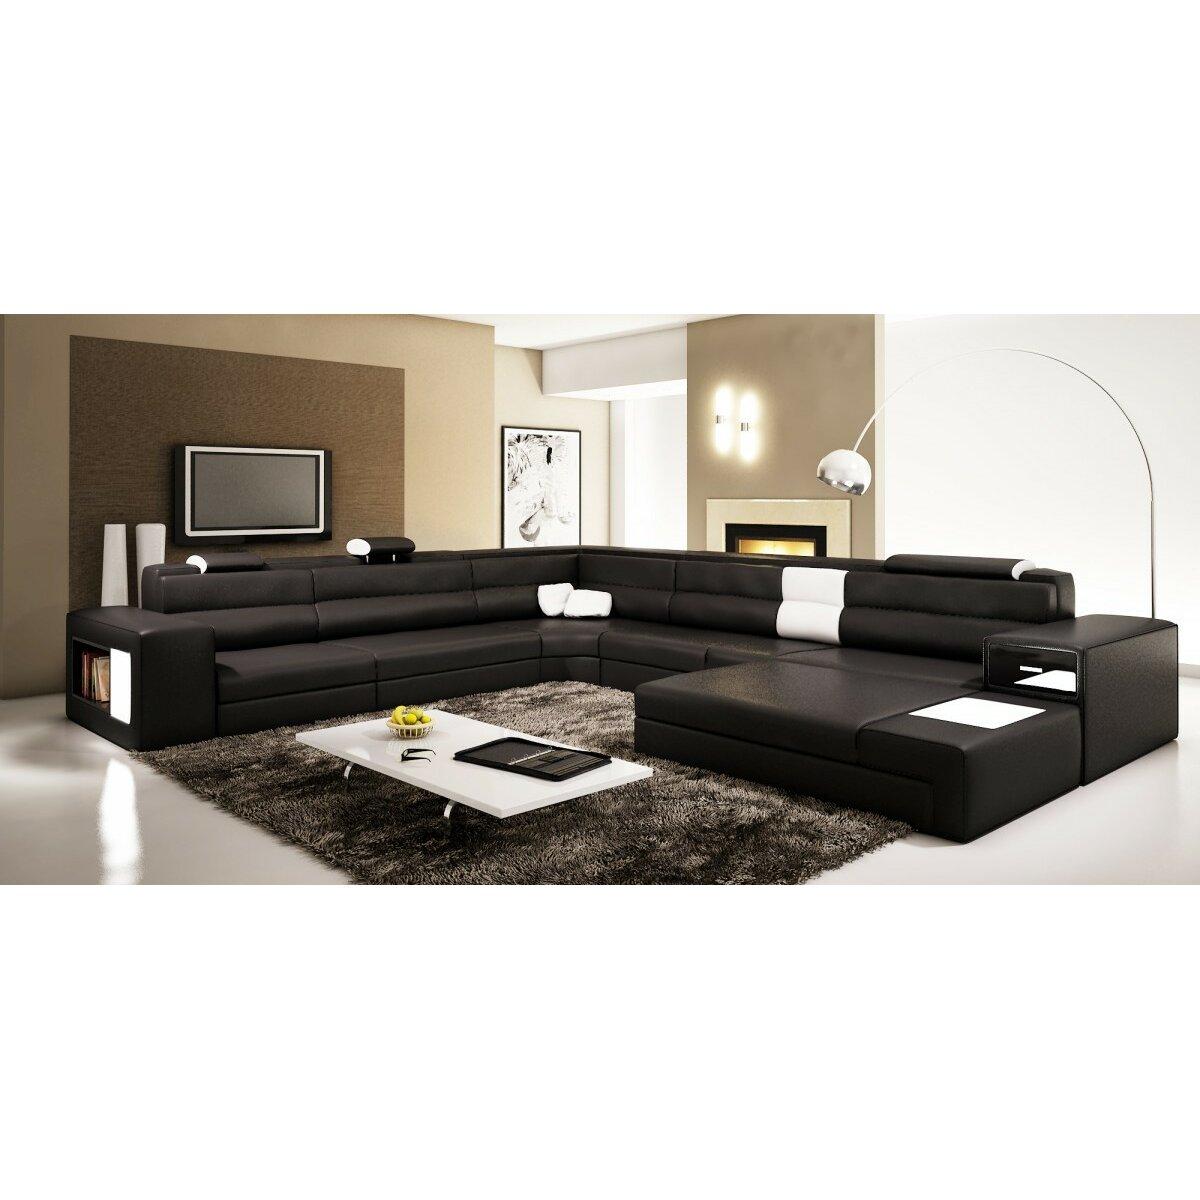 Hokku designs camden sectional wayfair for Hokku designs living room furniture